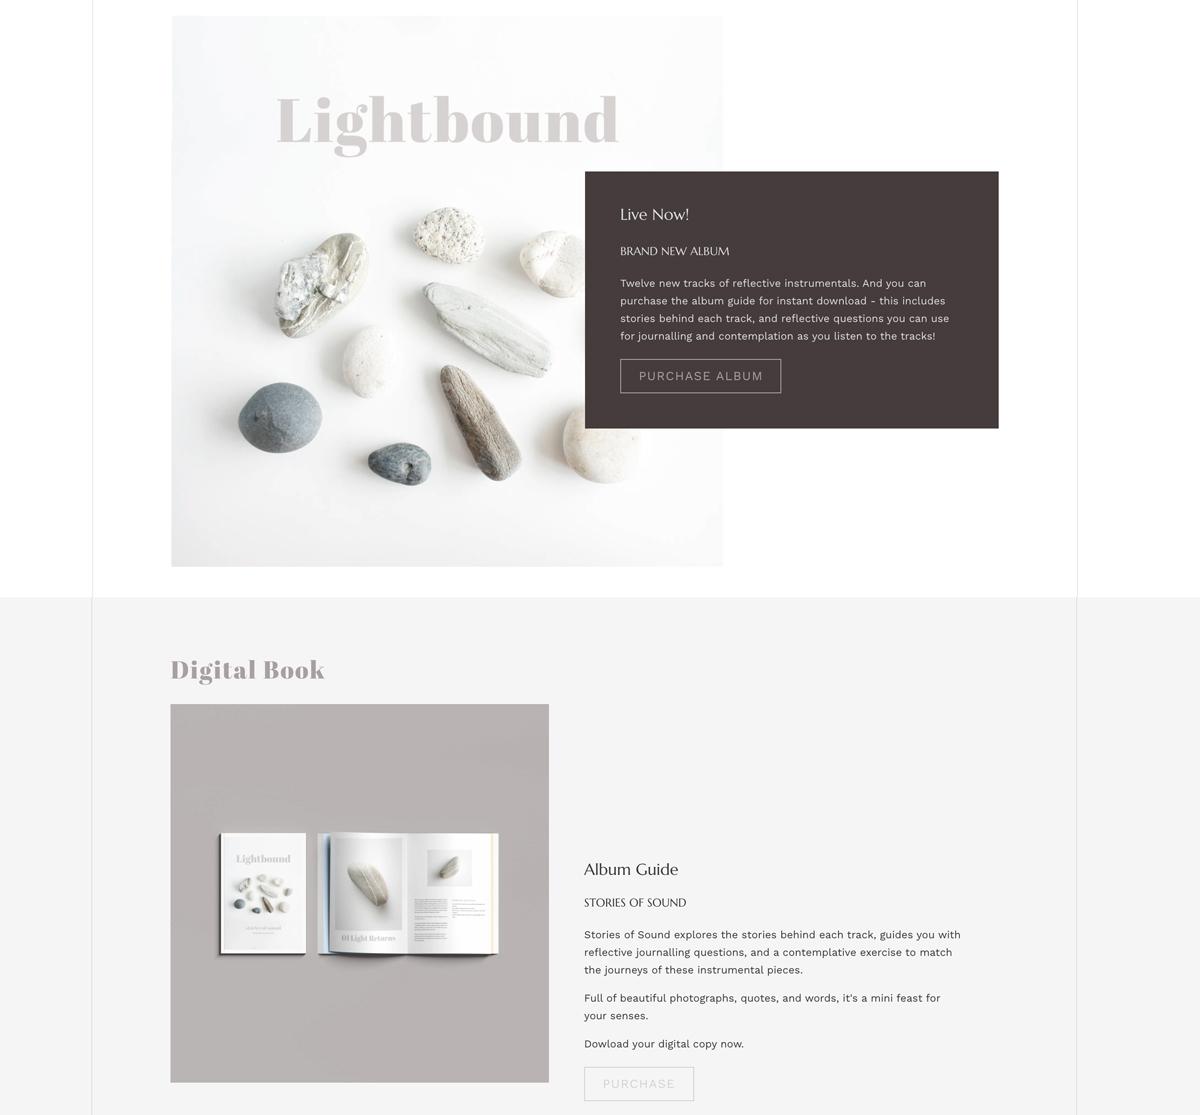 7 ways to create band website layouts you'll love - Bandzoogle Blog - Homepage